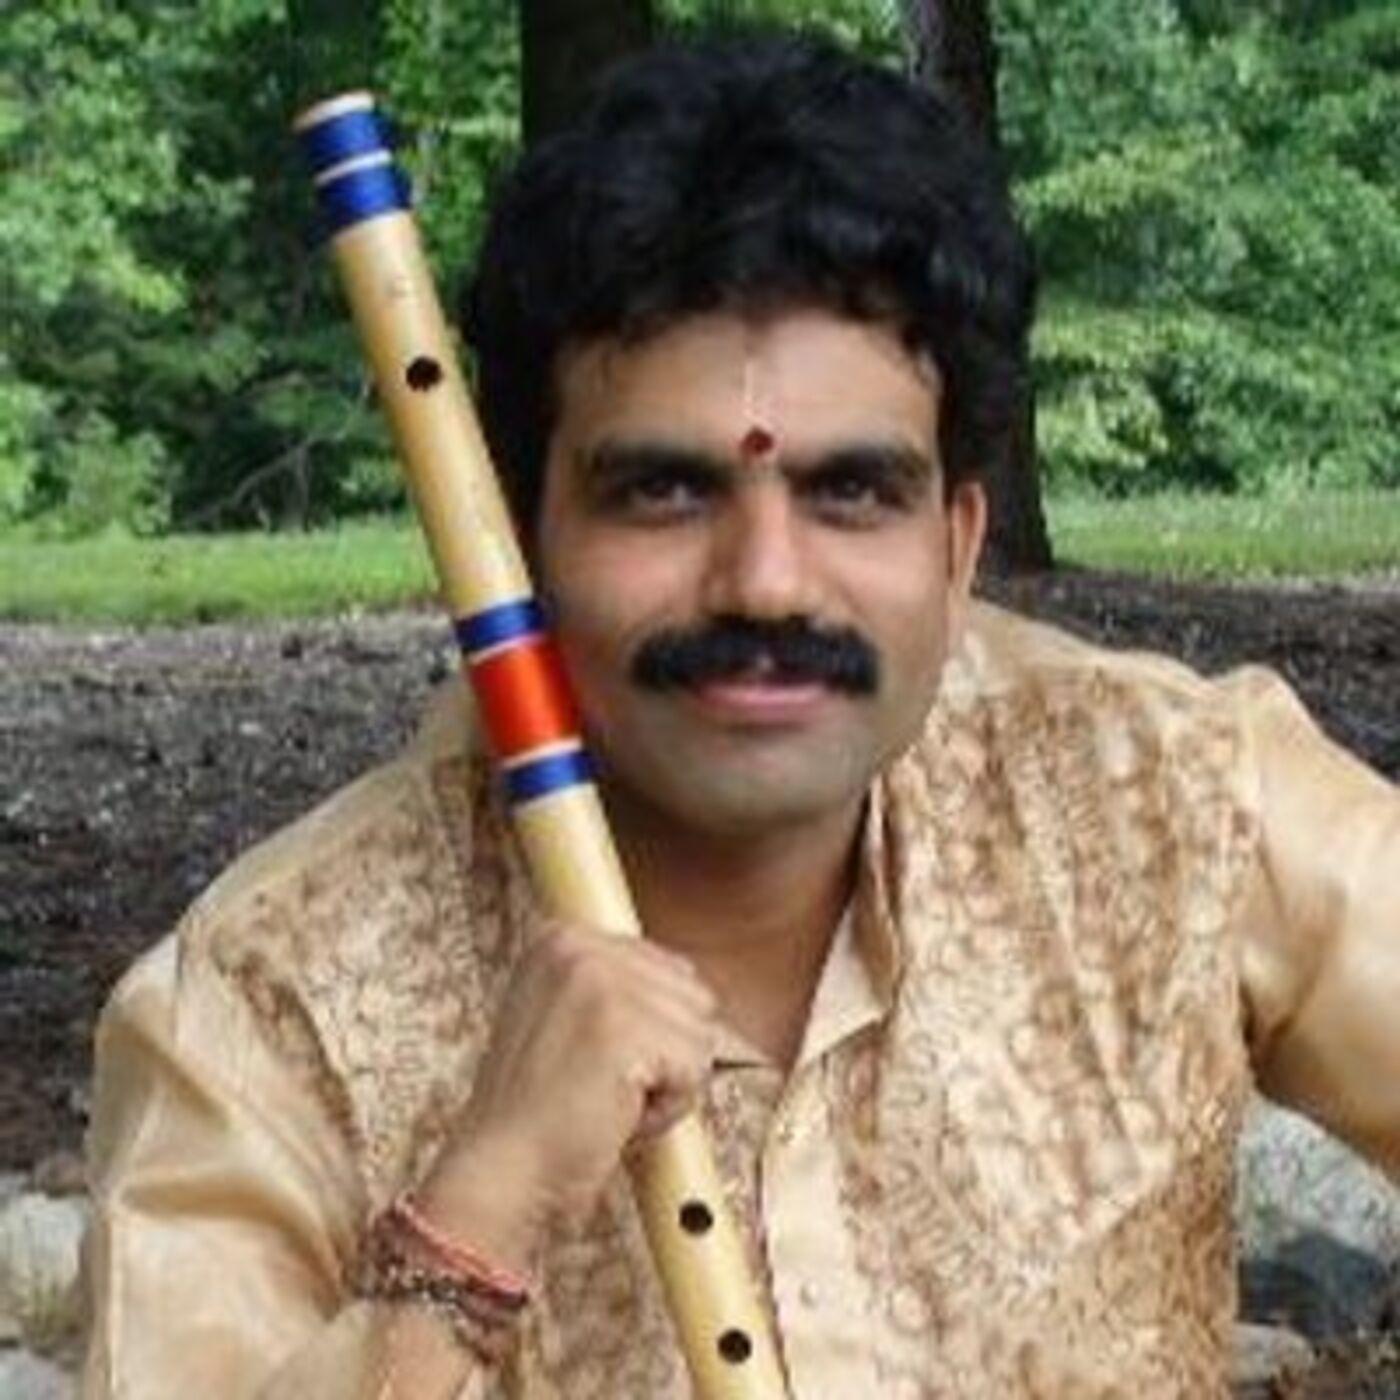 [Bonus] Music Mashtun: Flute Raman performs Mountain's Dawn!